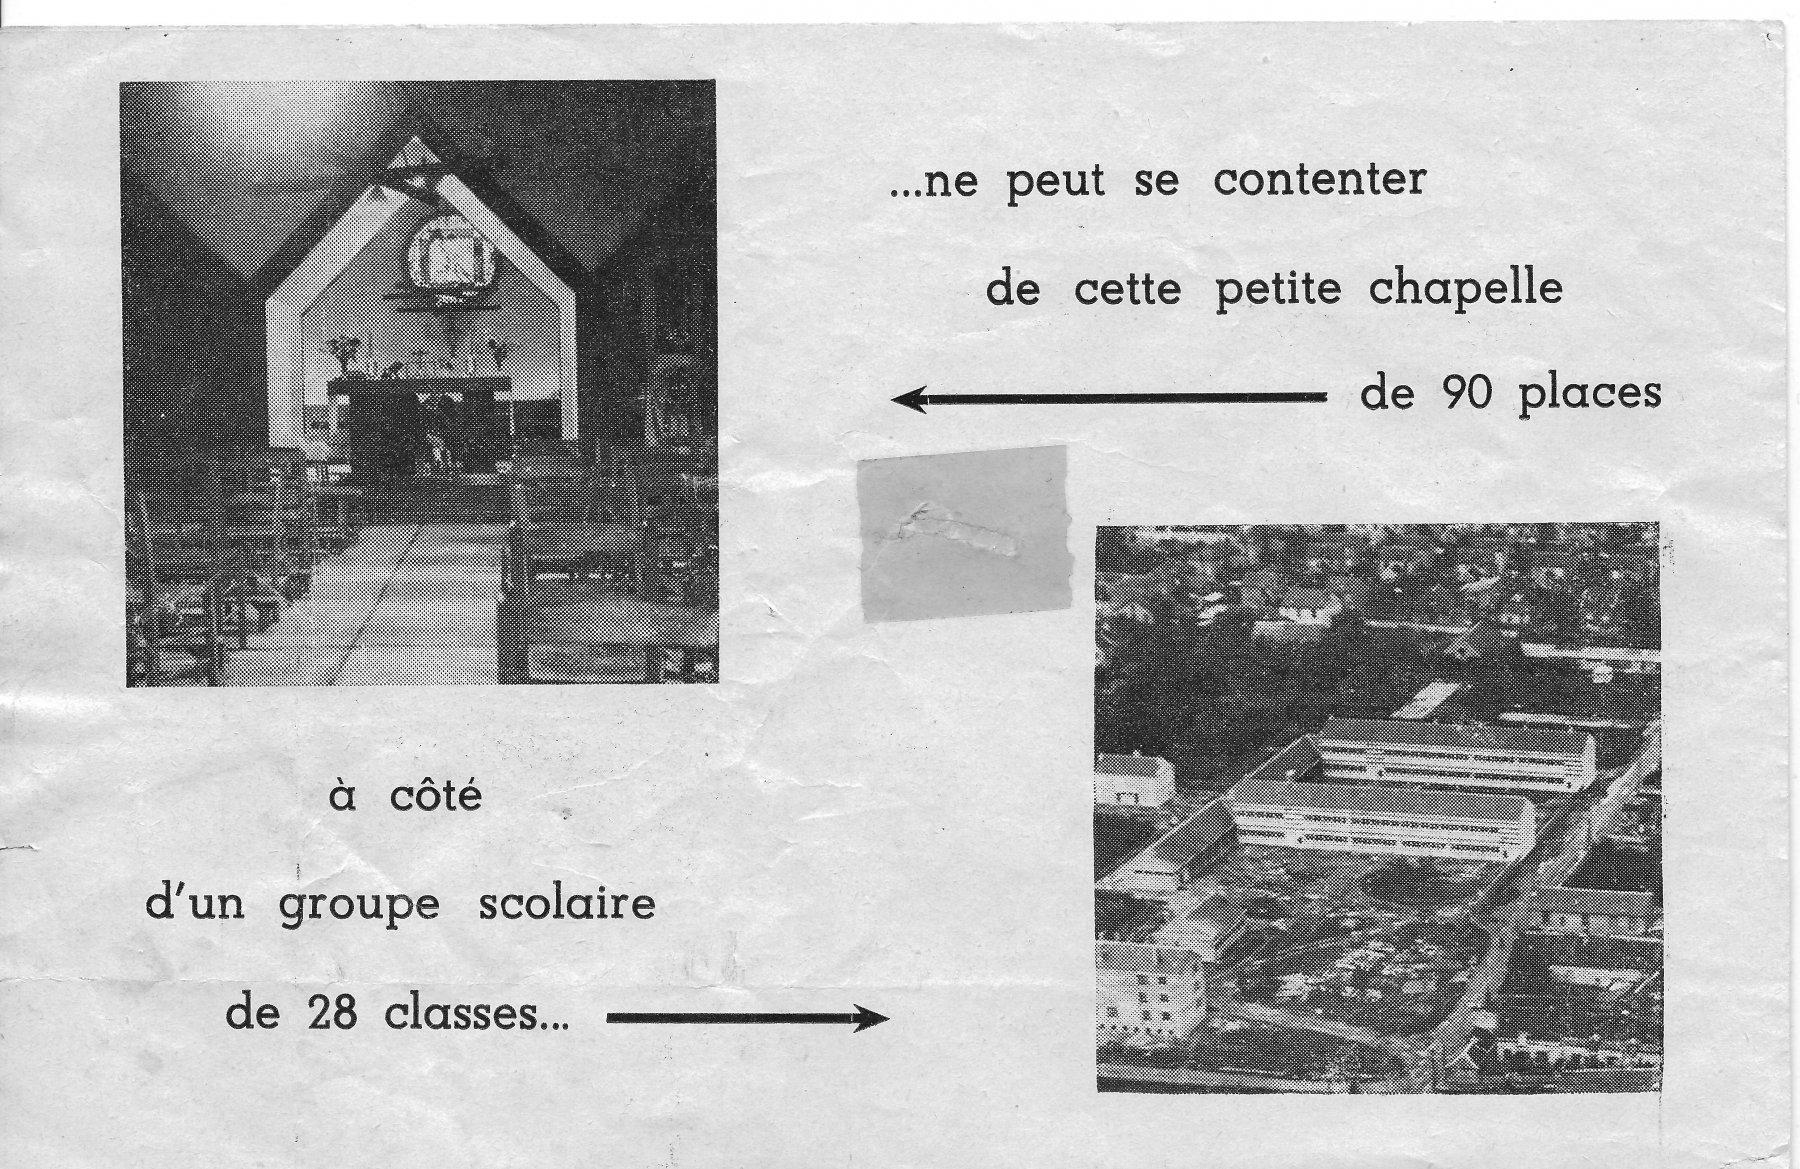 36-Docs-Lydie-Gascoin-21-Batiments-Don-Bosco-Prospectus-Argonne-2